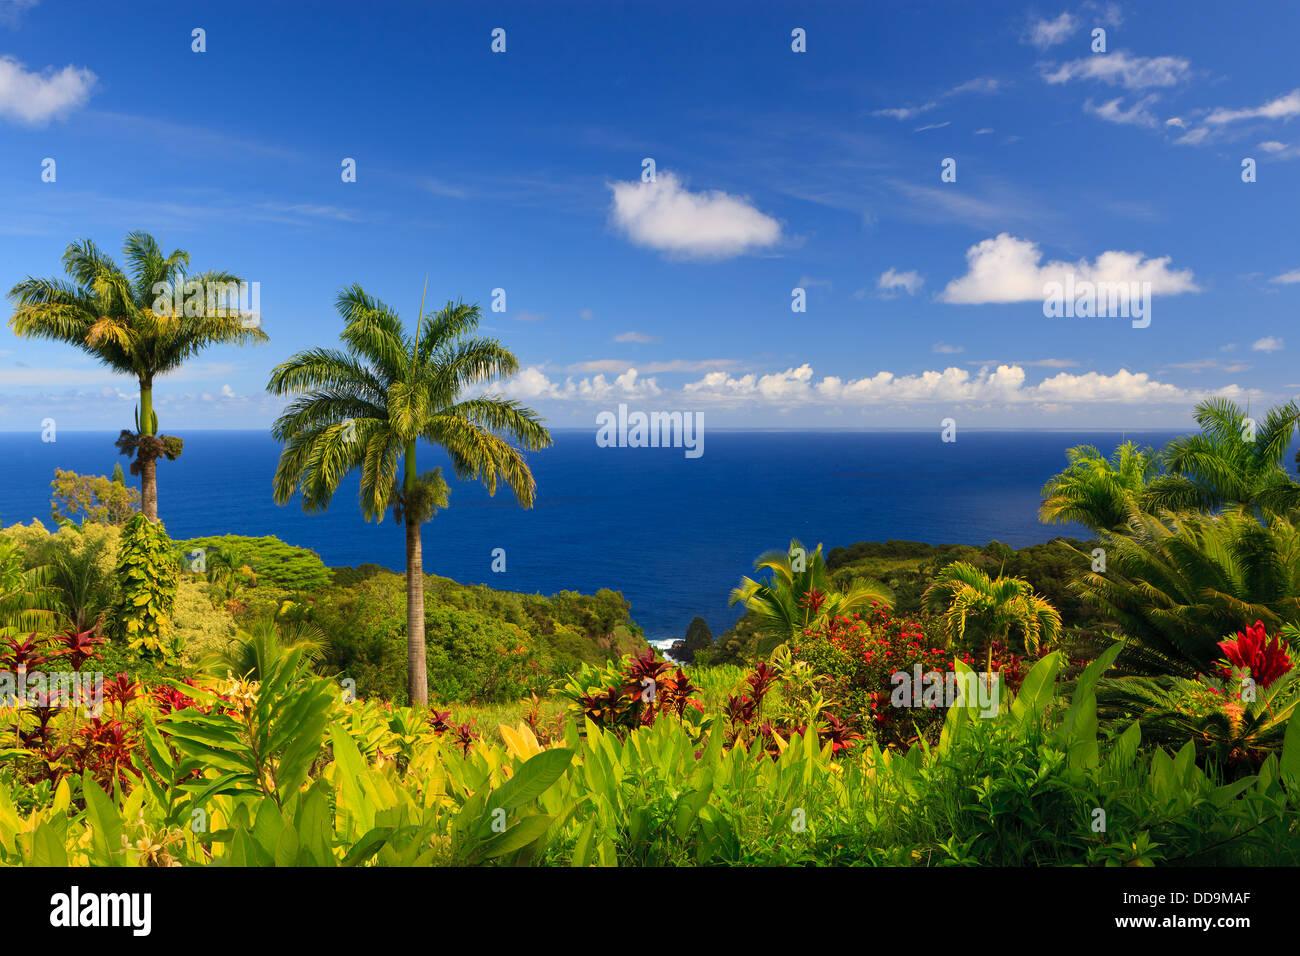 Vista oceano dal giardino di Eden, Maui, Hawaii Immagini Stock